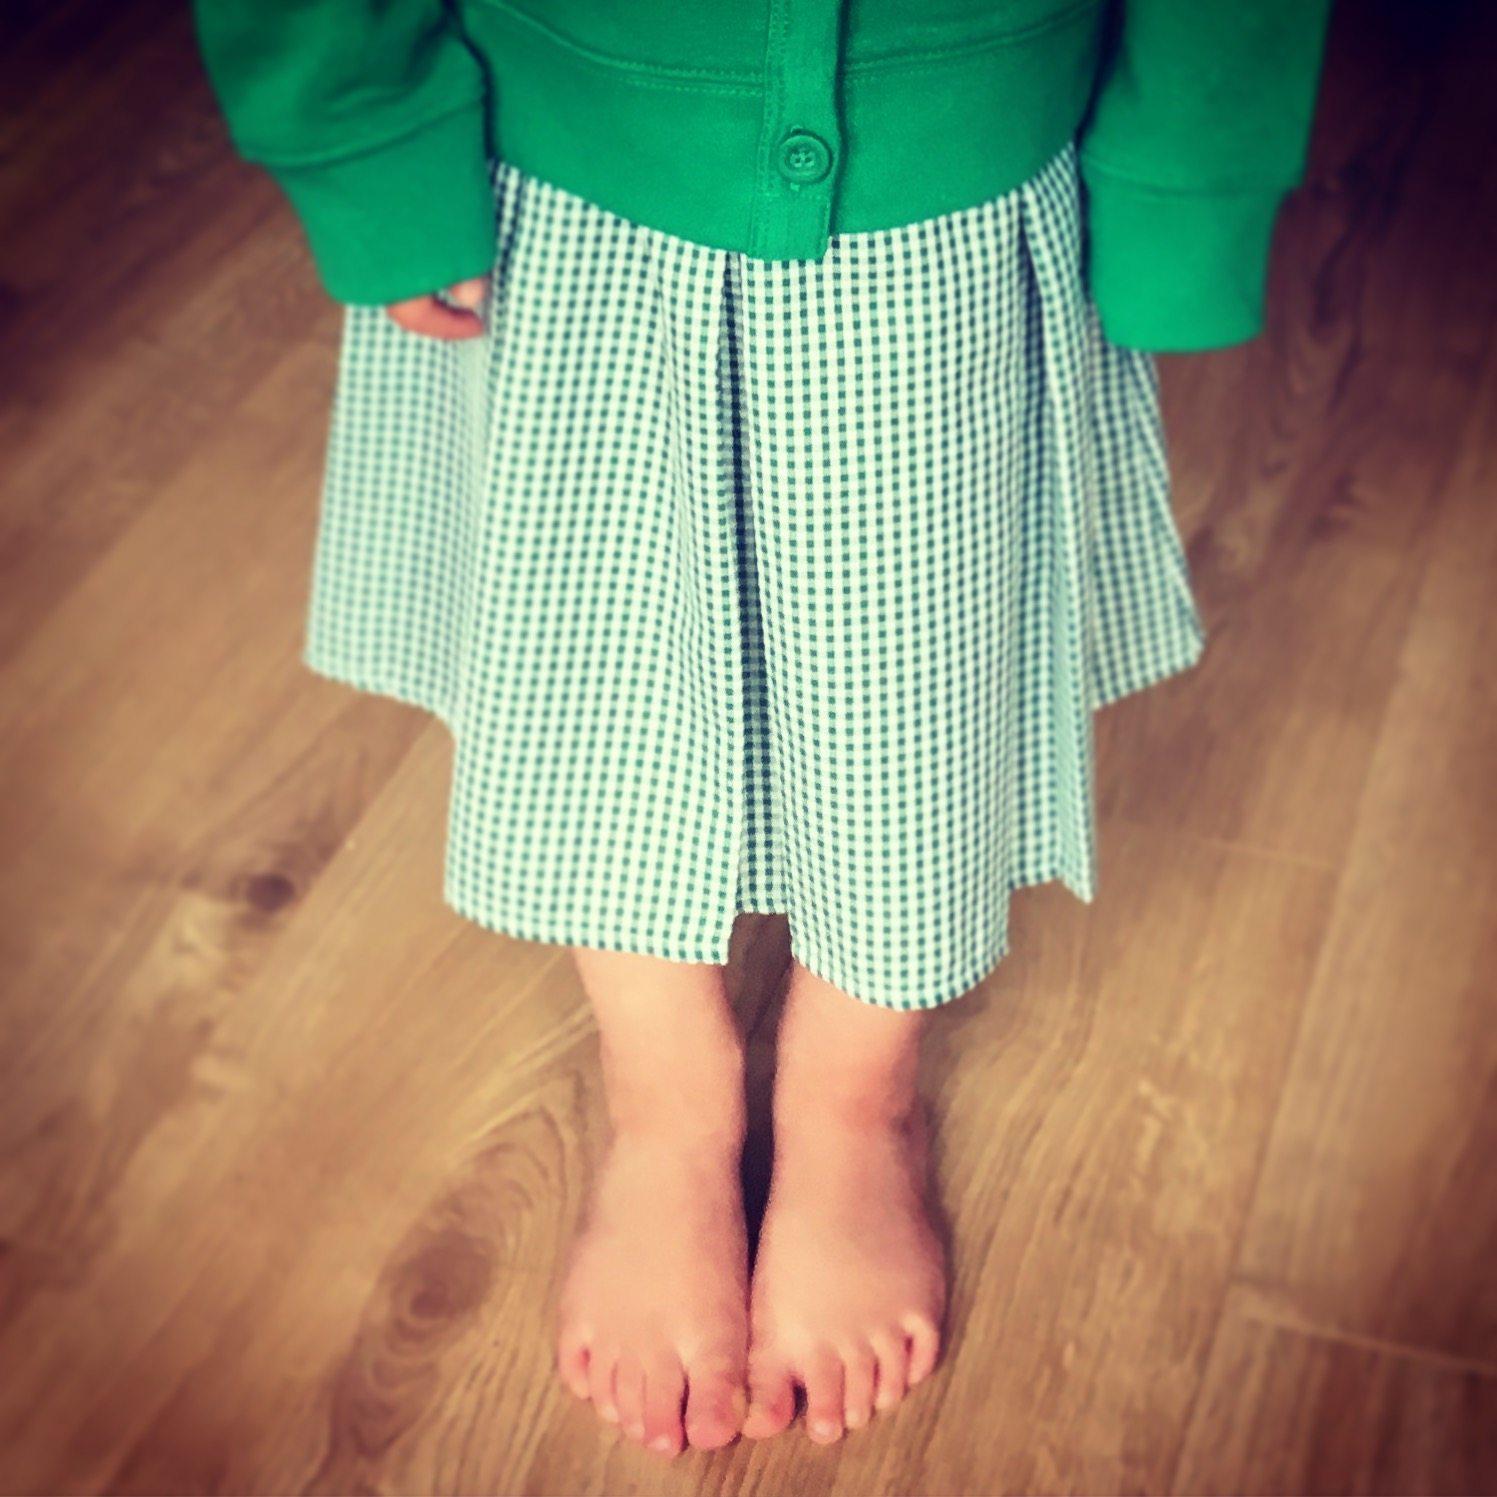 gurest post the parent poet picture of girl in school gingham dress